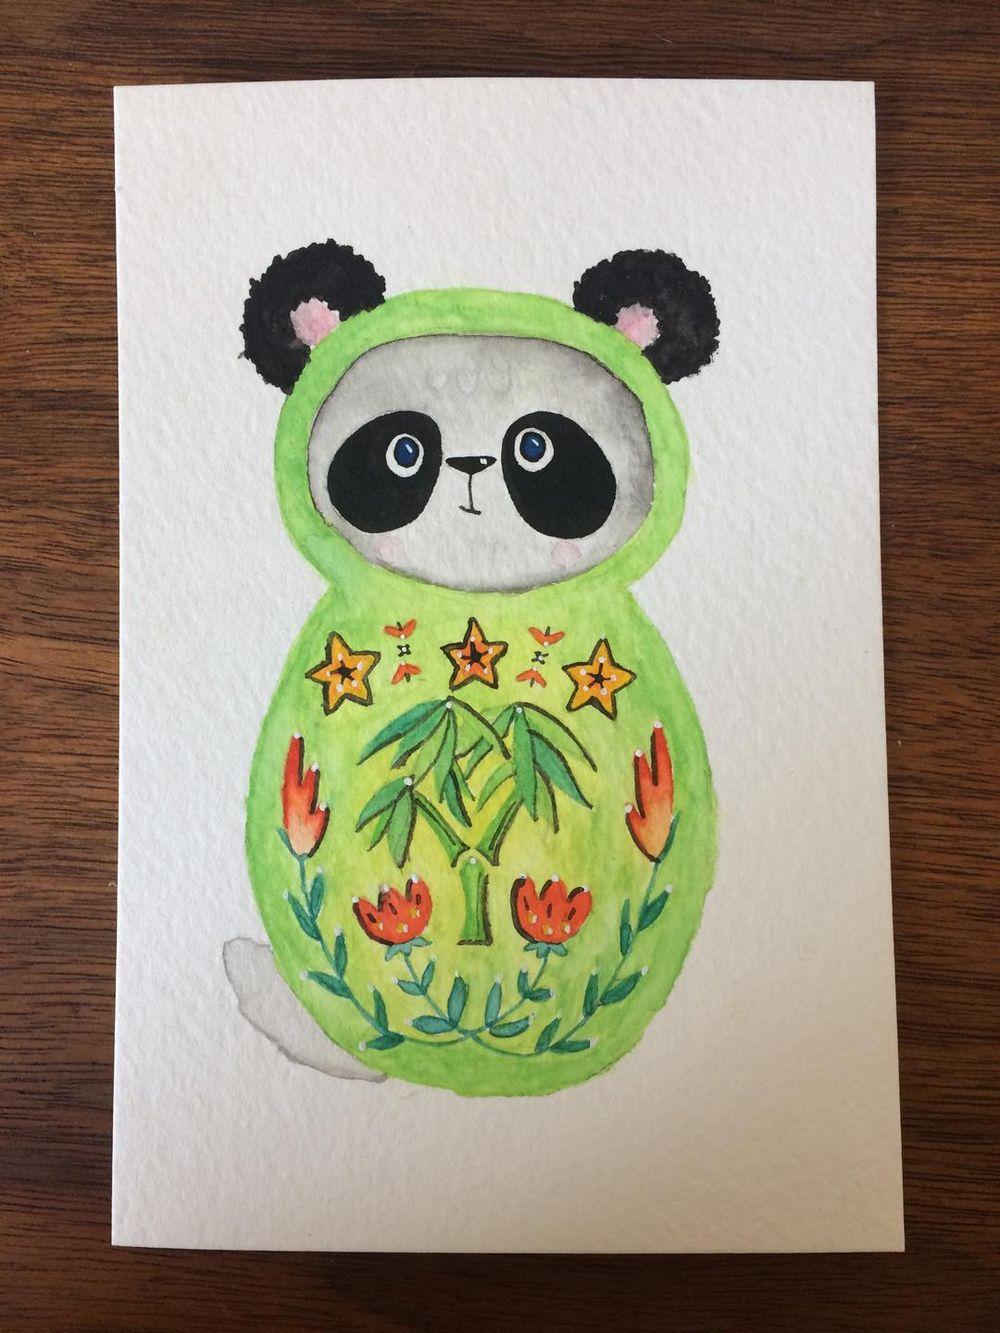 Panda Nesting Doll - image 1 - student project